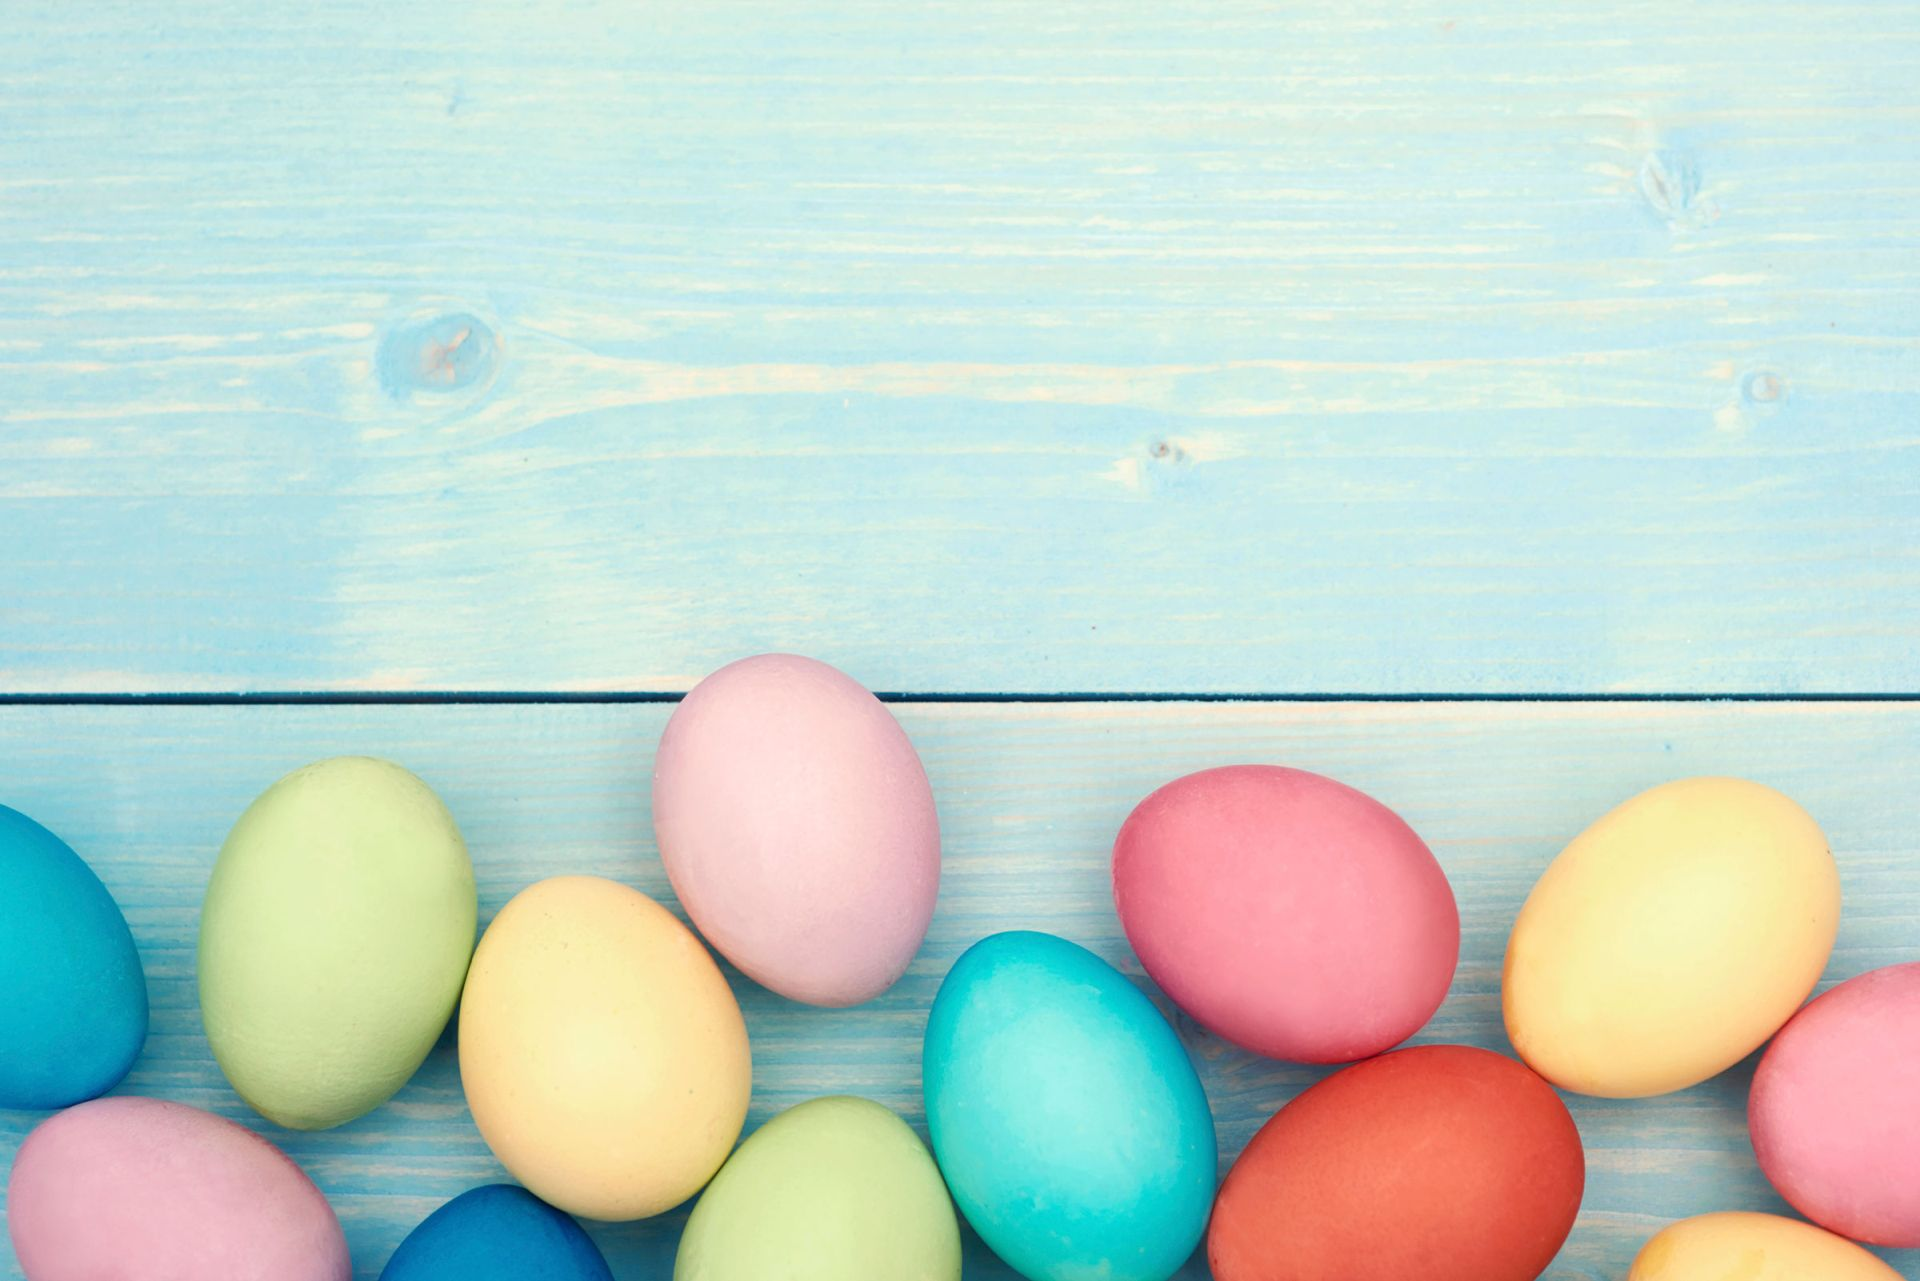 aster Egg Backgrounds – HD Easter Images